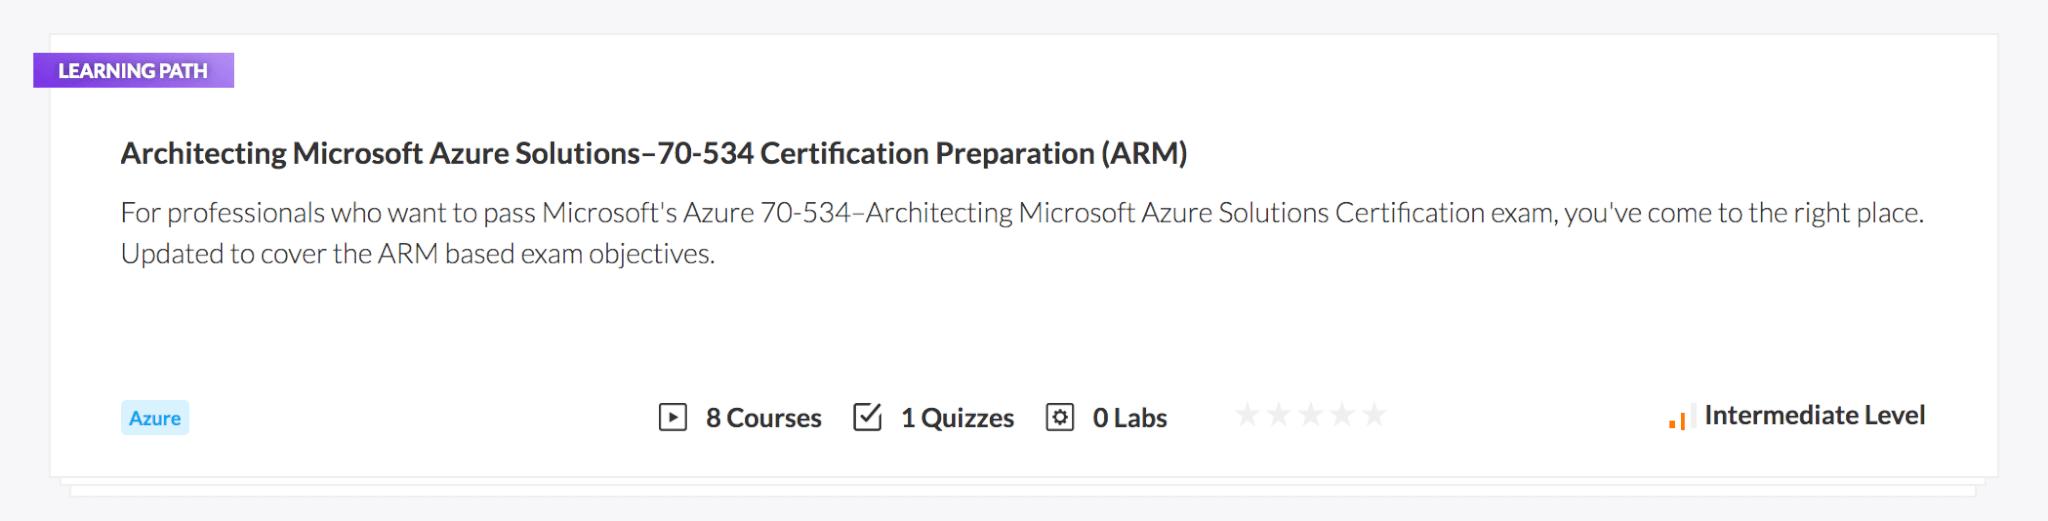 Architecting Microsoft Azure Solutions–70-534 Certification Preparation (ARM)